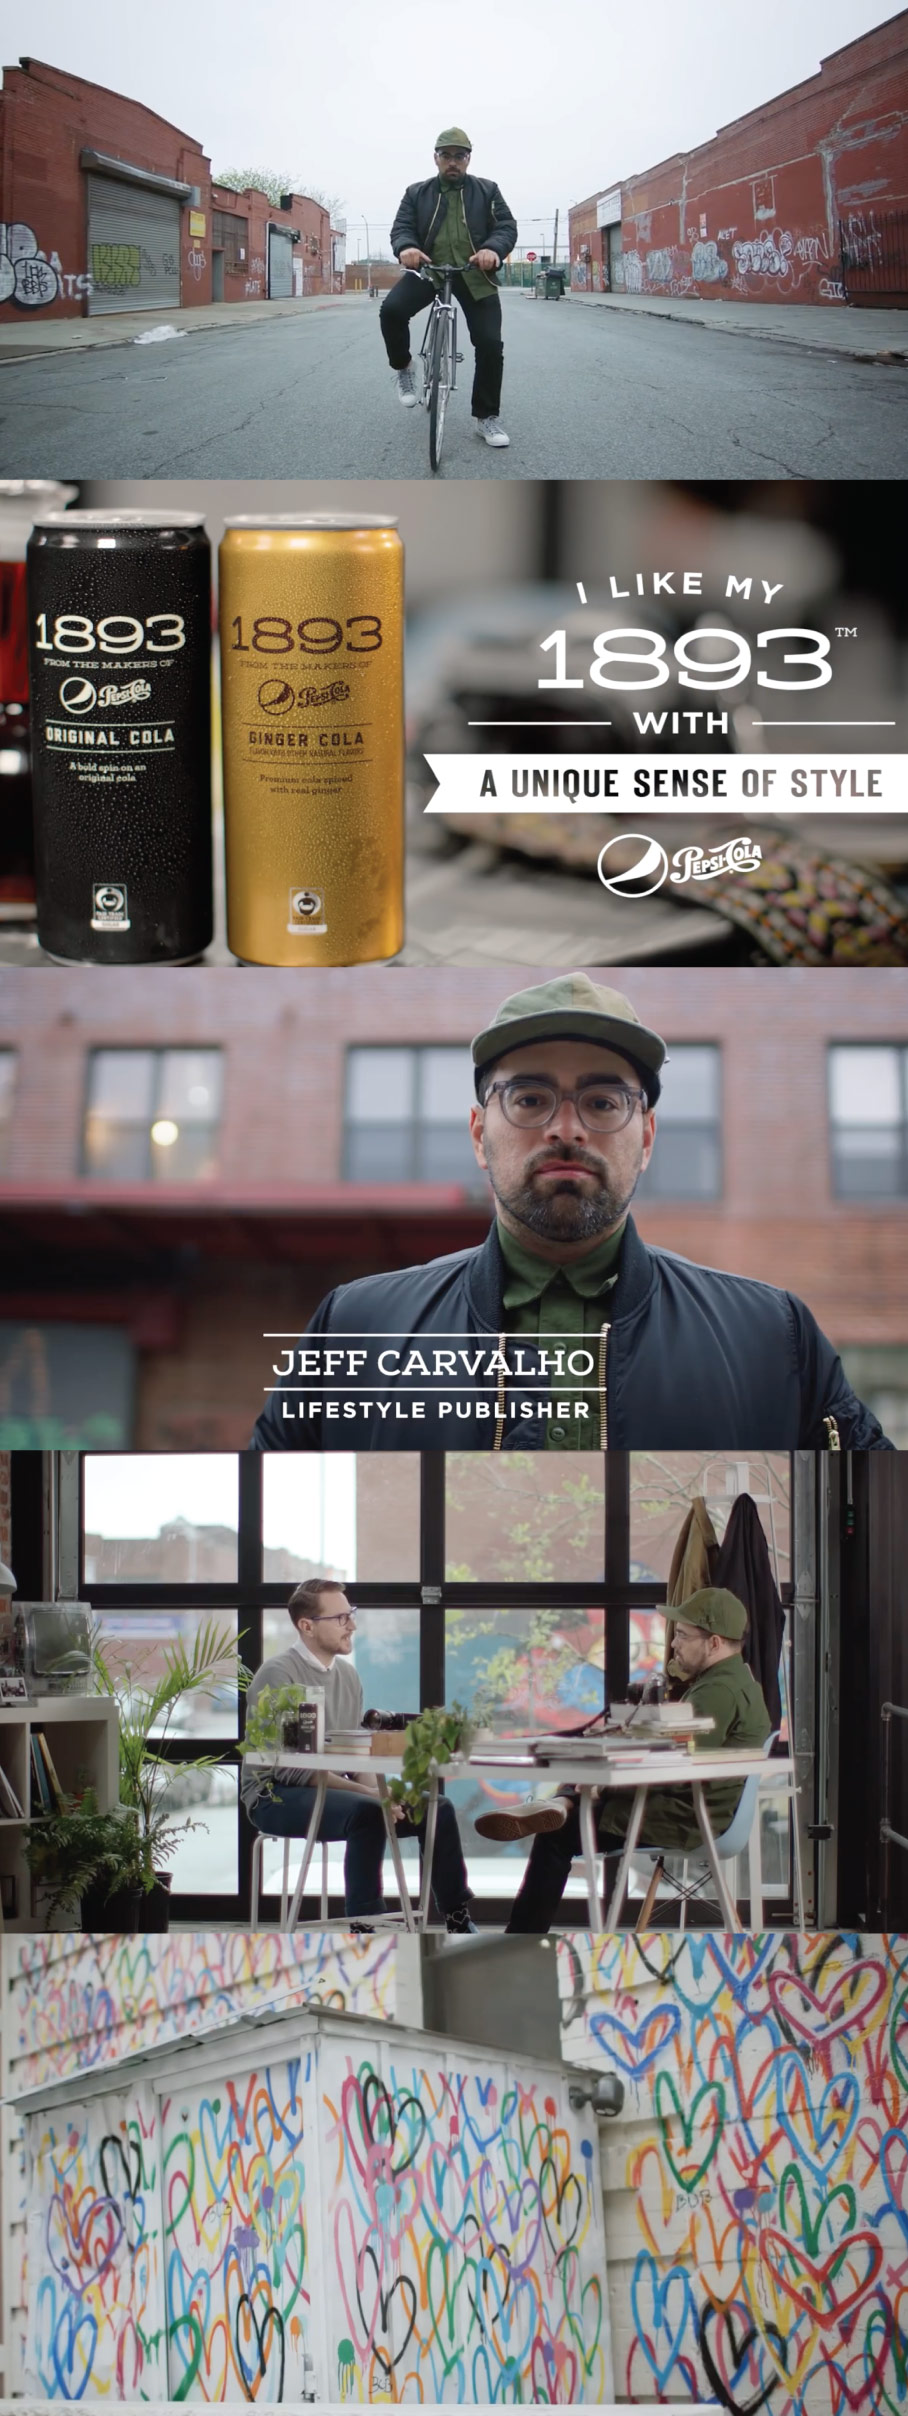 Jeff carvalho thumbnail